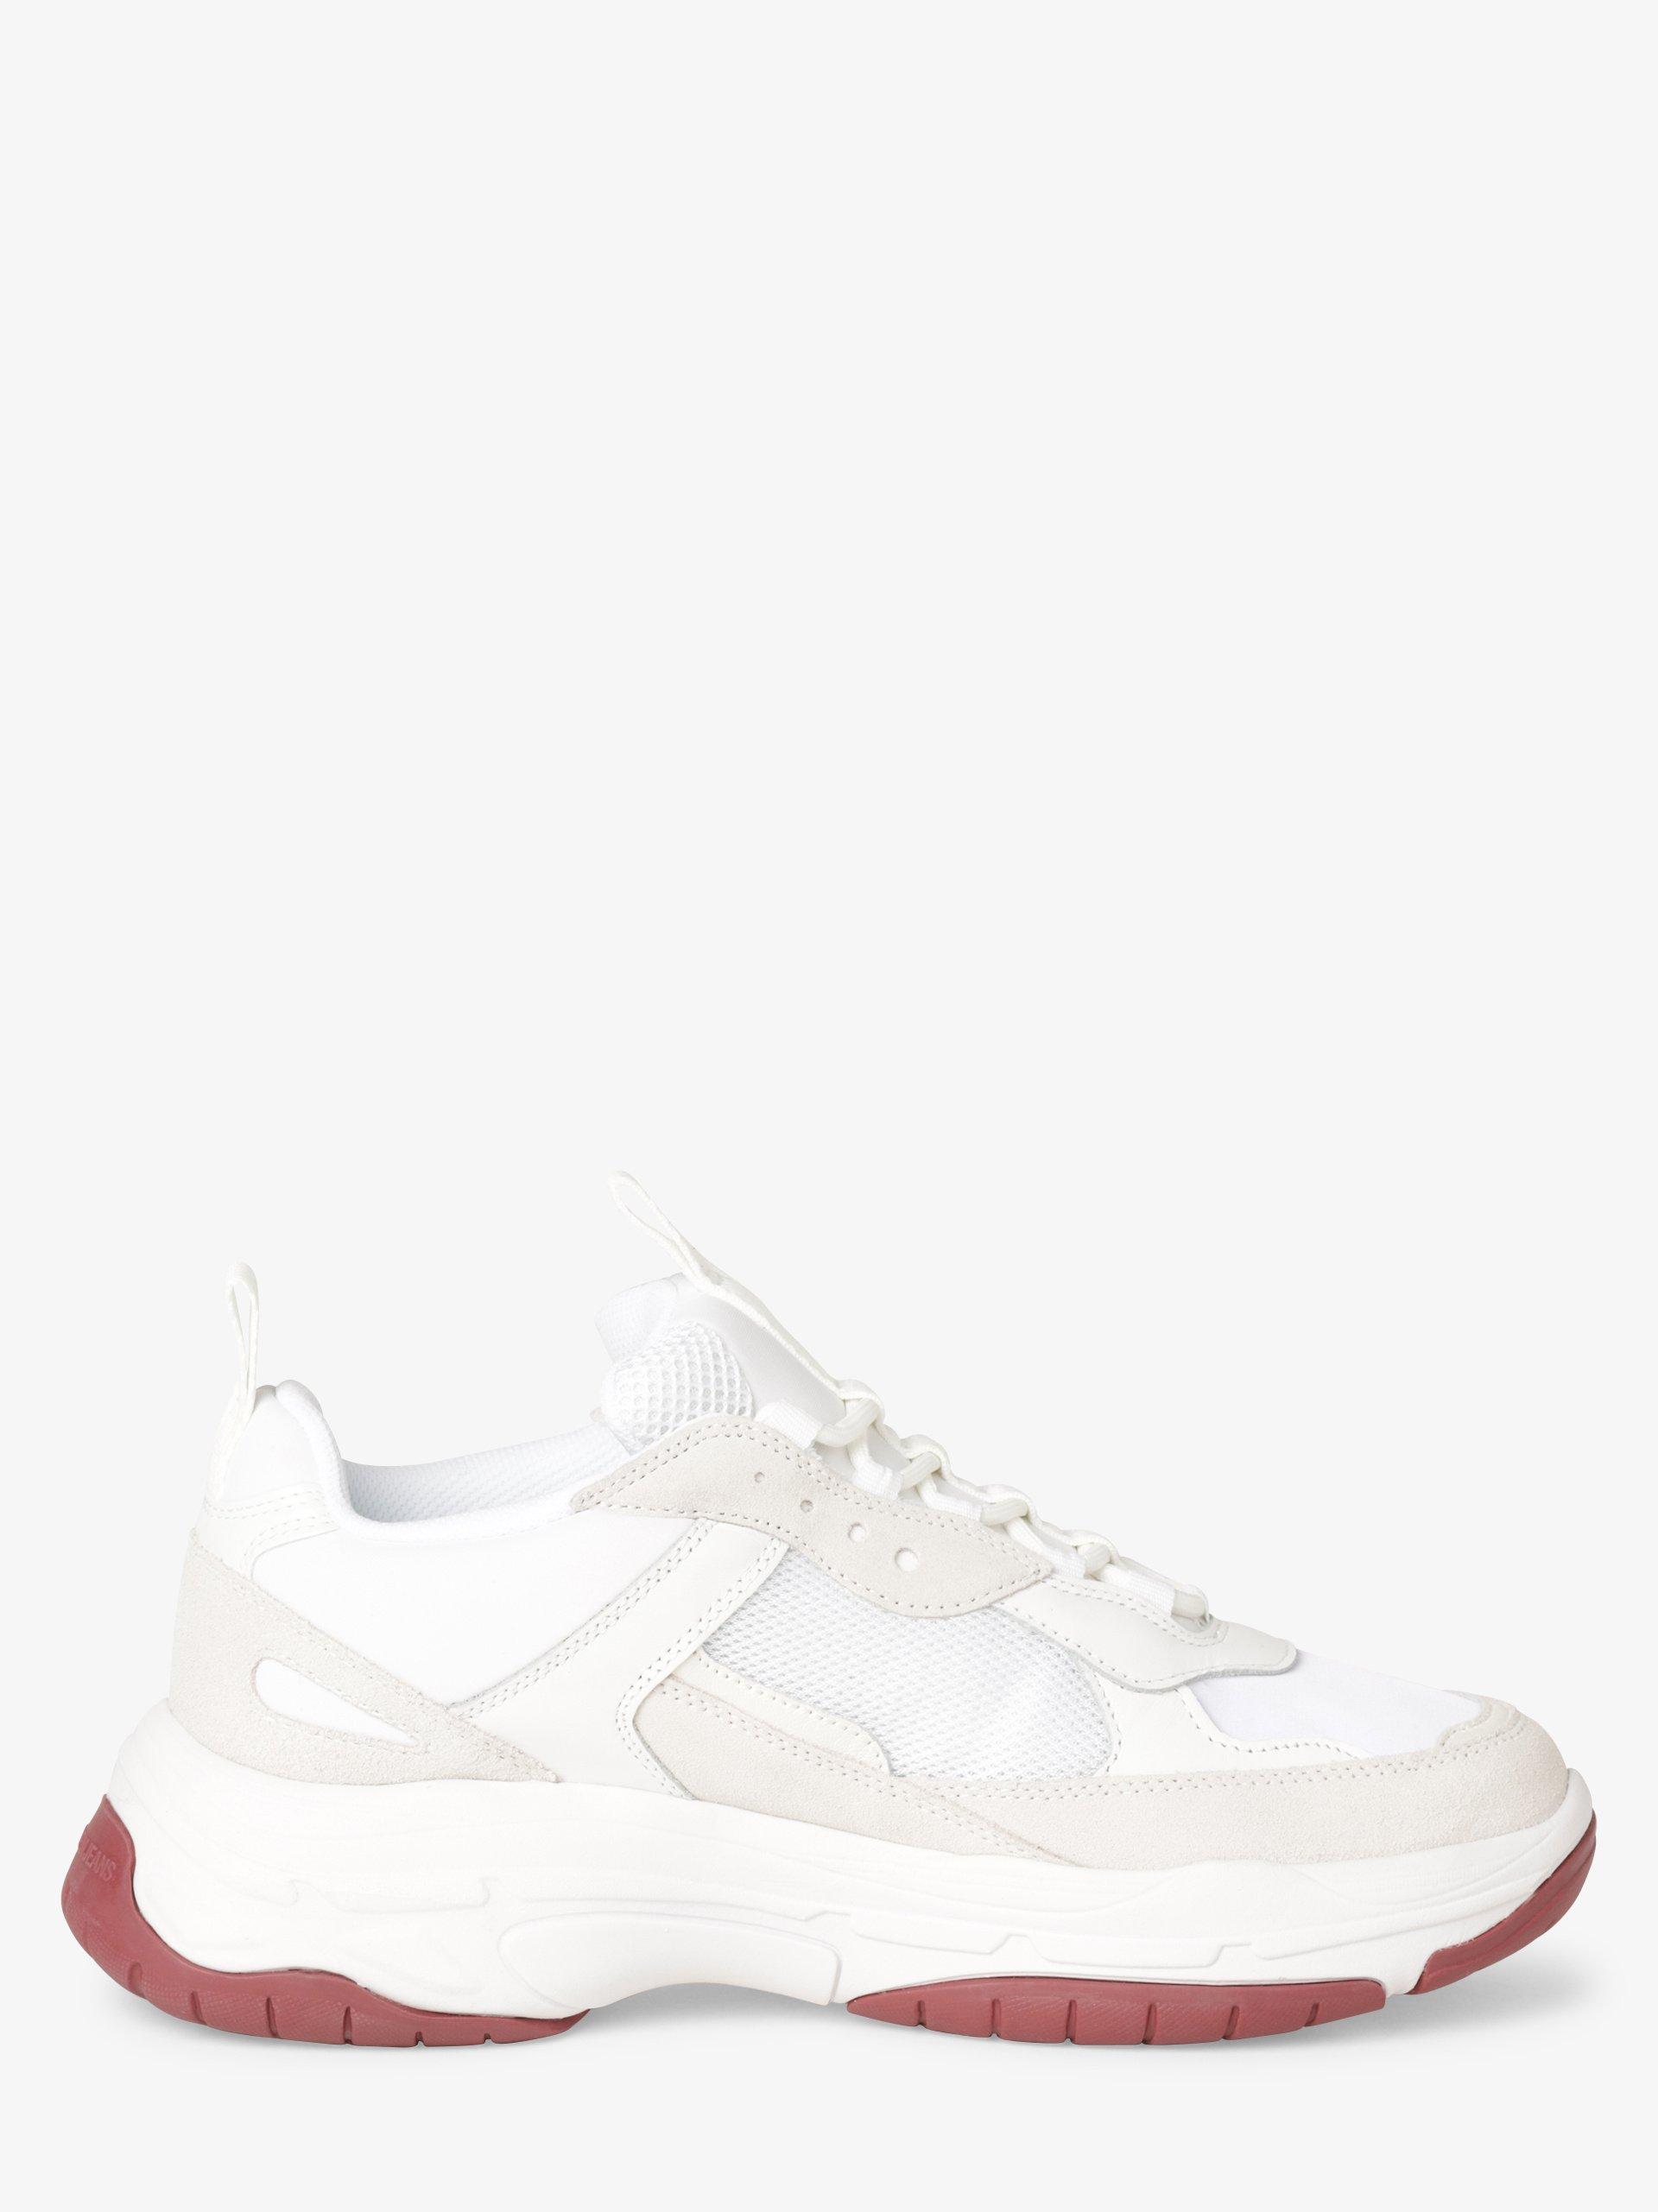 Calvin Klein Jeans Herren Sneaker mit Leder-Anteil - Marvin